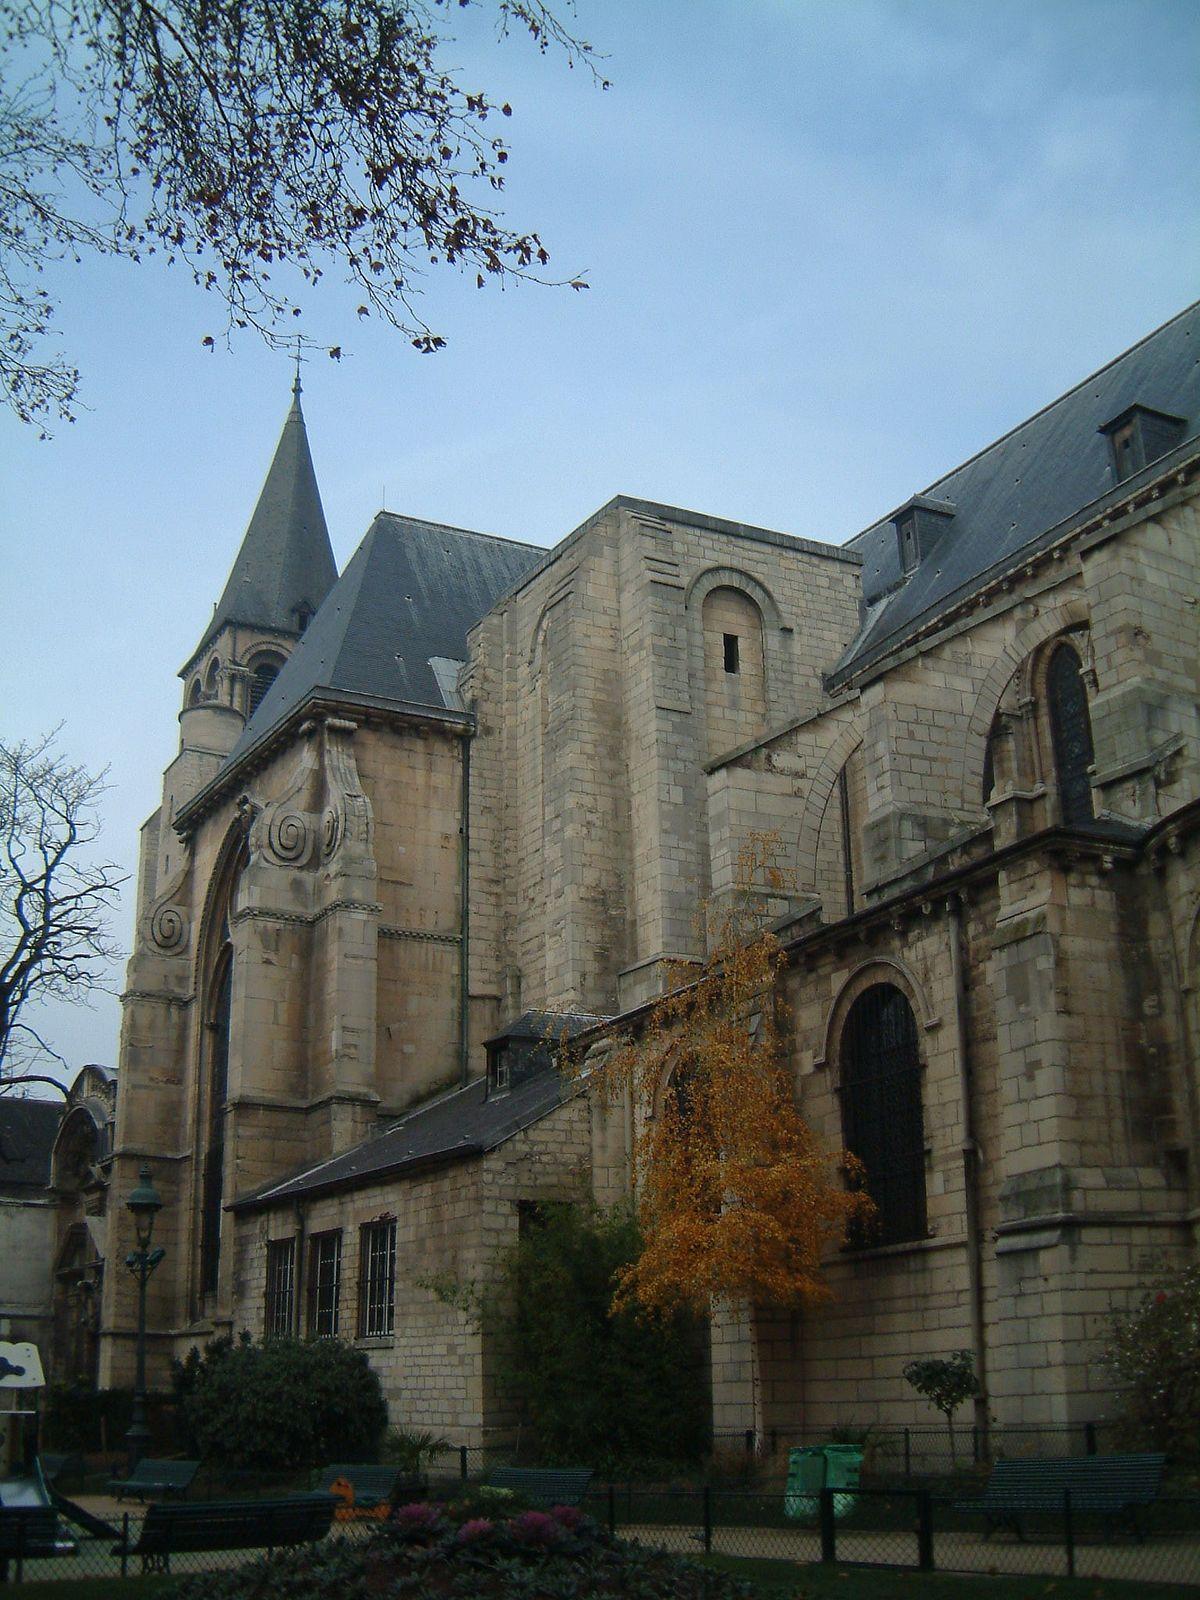 Abtei Saint Germain Des Pr U00e9s U2013 Wikipedia